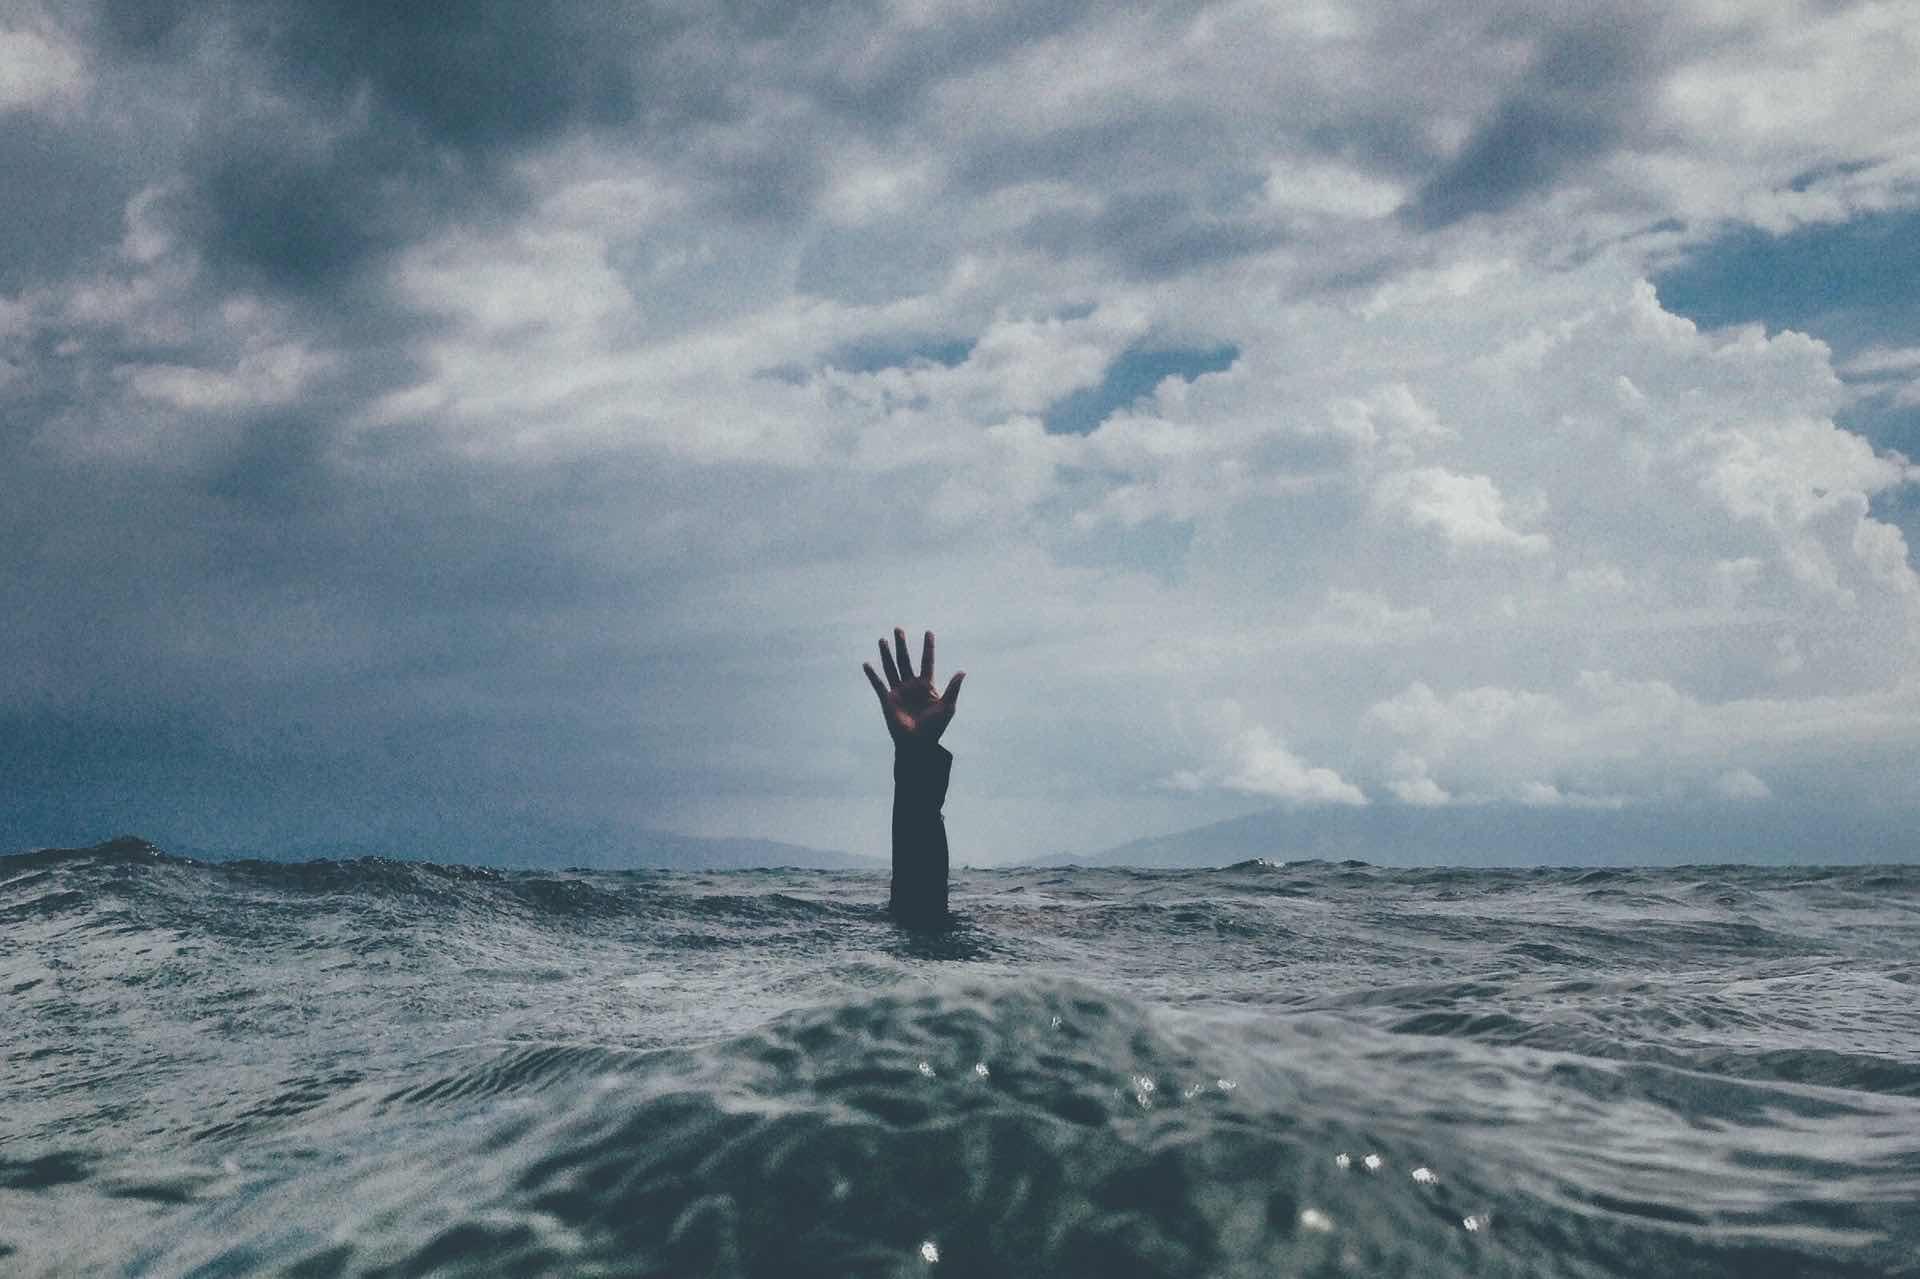 mer tristesse eau aide bras main